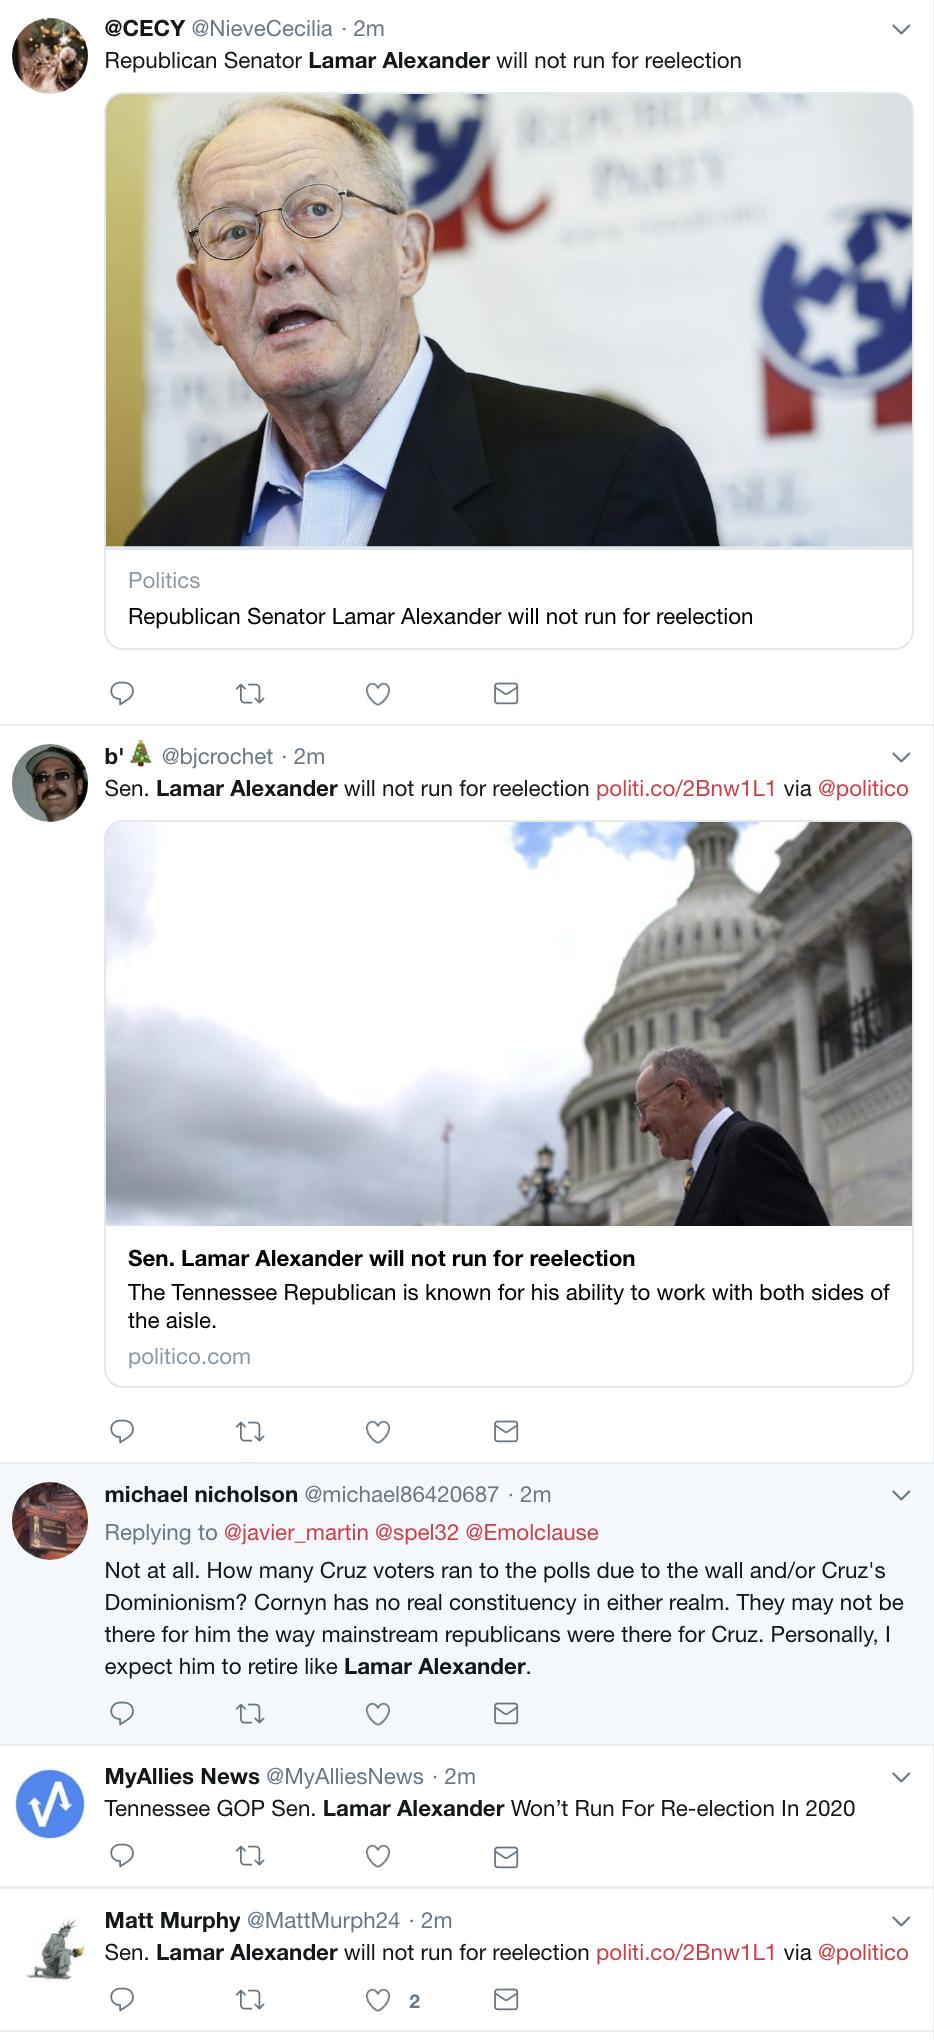 Screen-Shot-2018-12-17-at-12.44.13-PM Republican Senate Staple Announces He's Leaving As Trumpism Takes Over Donald Trump Election 2018 Election 2020 Politics